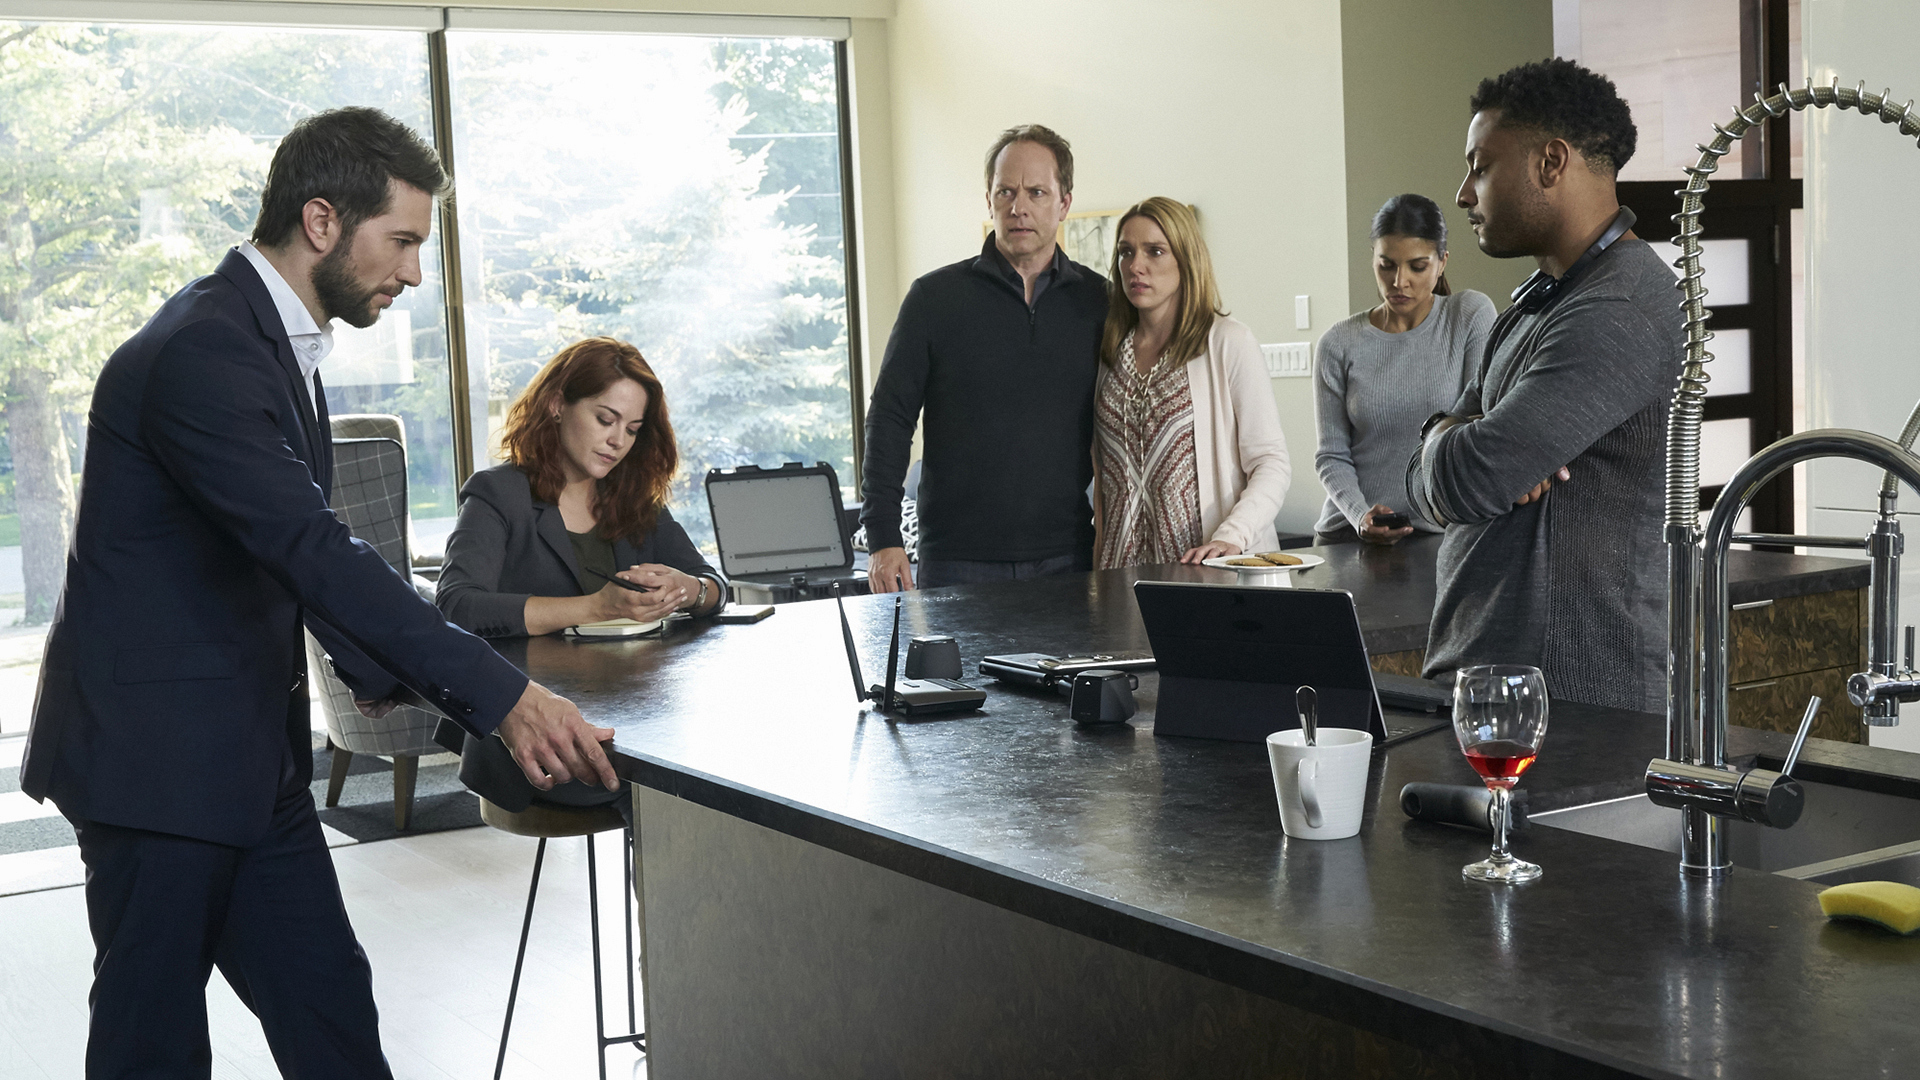 Luke Roberts as Eric Beaumont, Sarah Greene as Maxine Carlson, Nazneen Contractor as Zara Hallam, and Brandon Jay McLaren as Oliver Yates